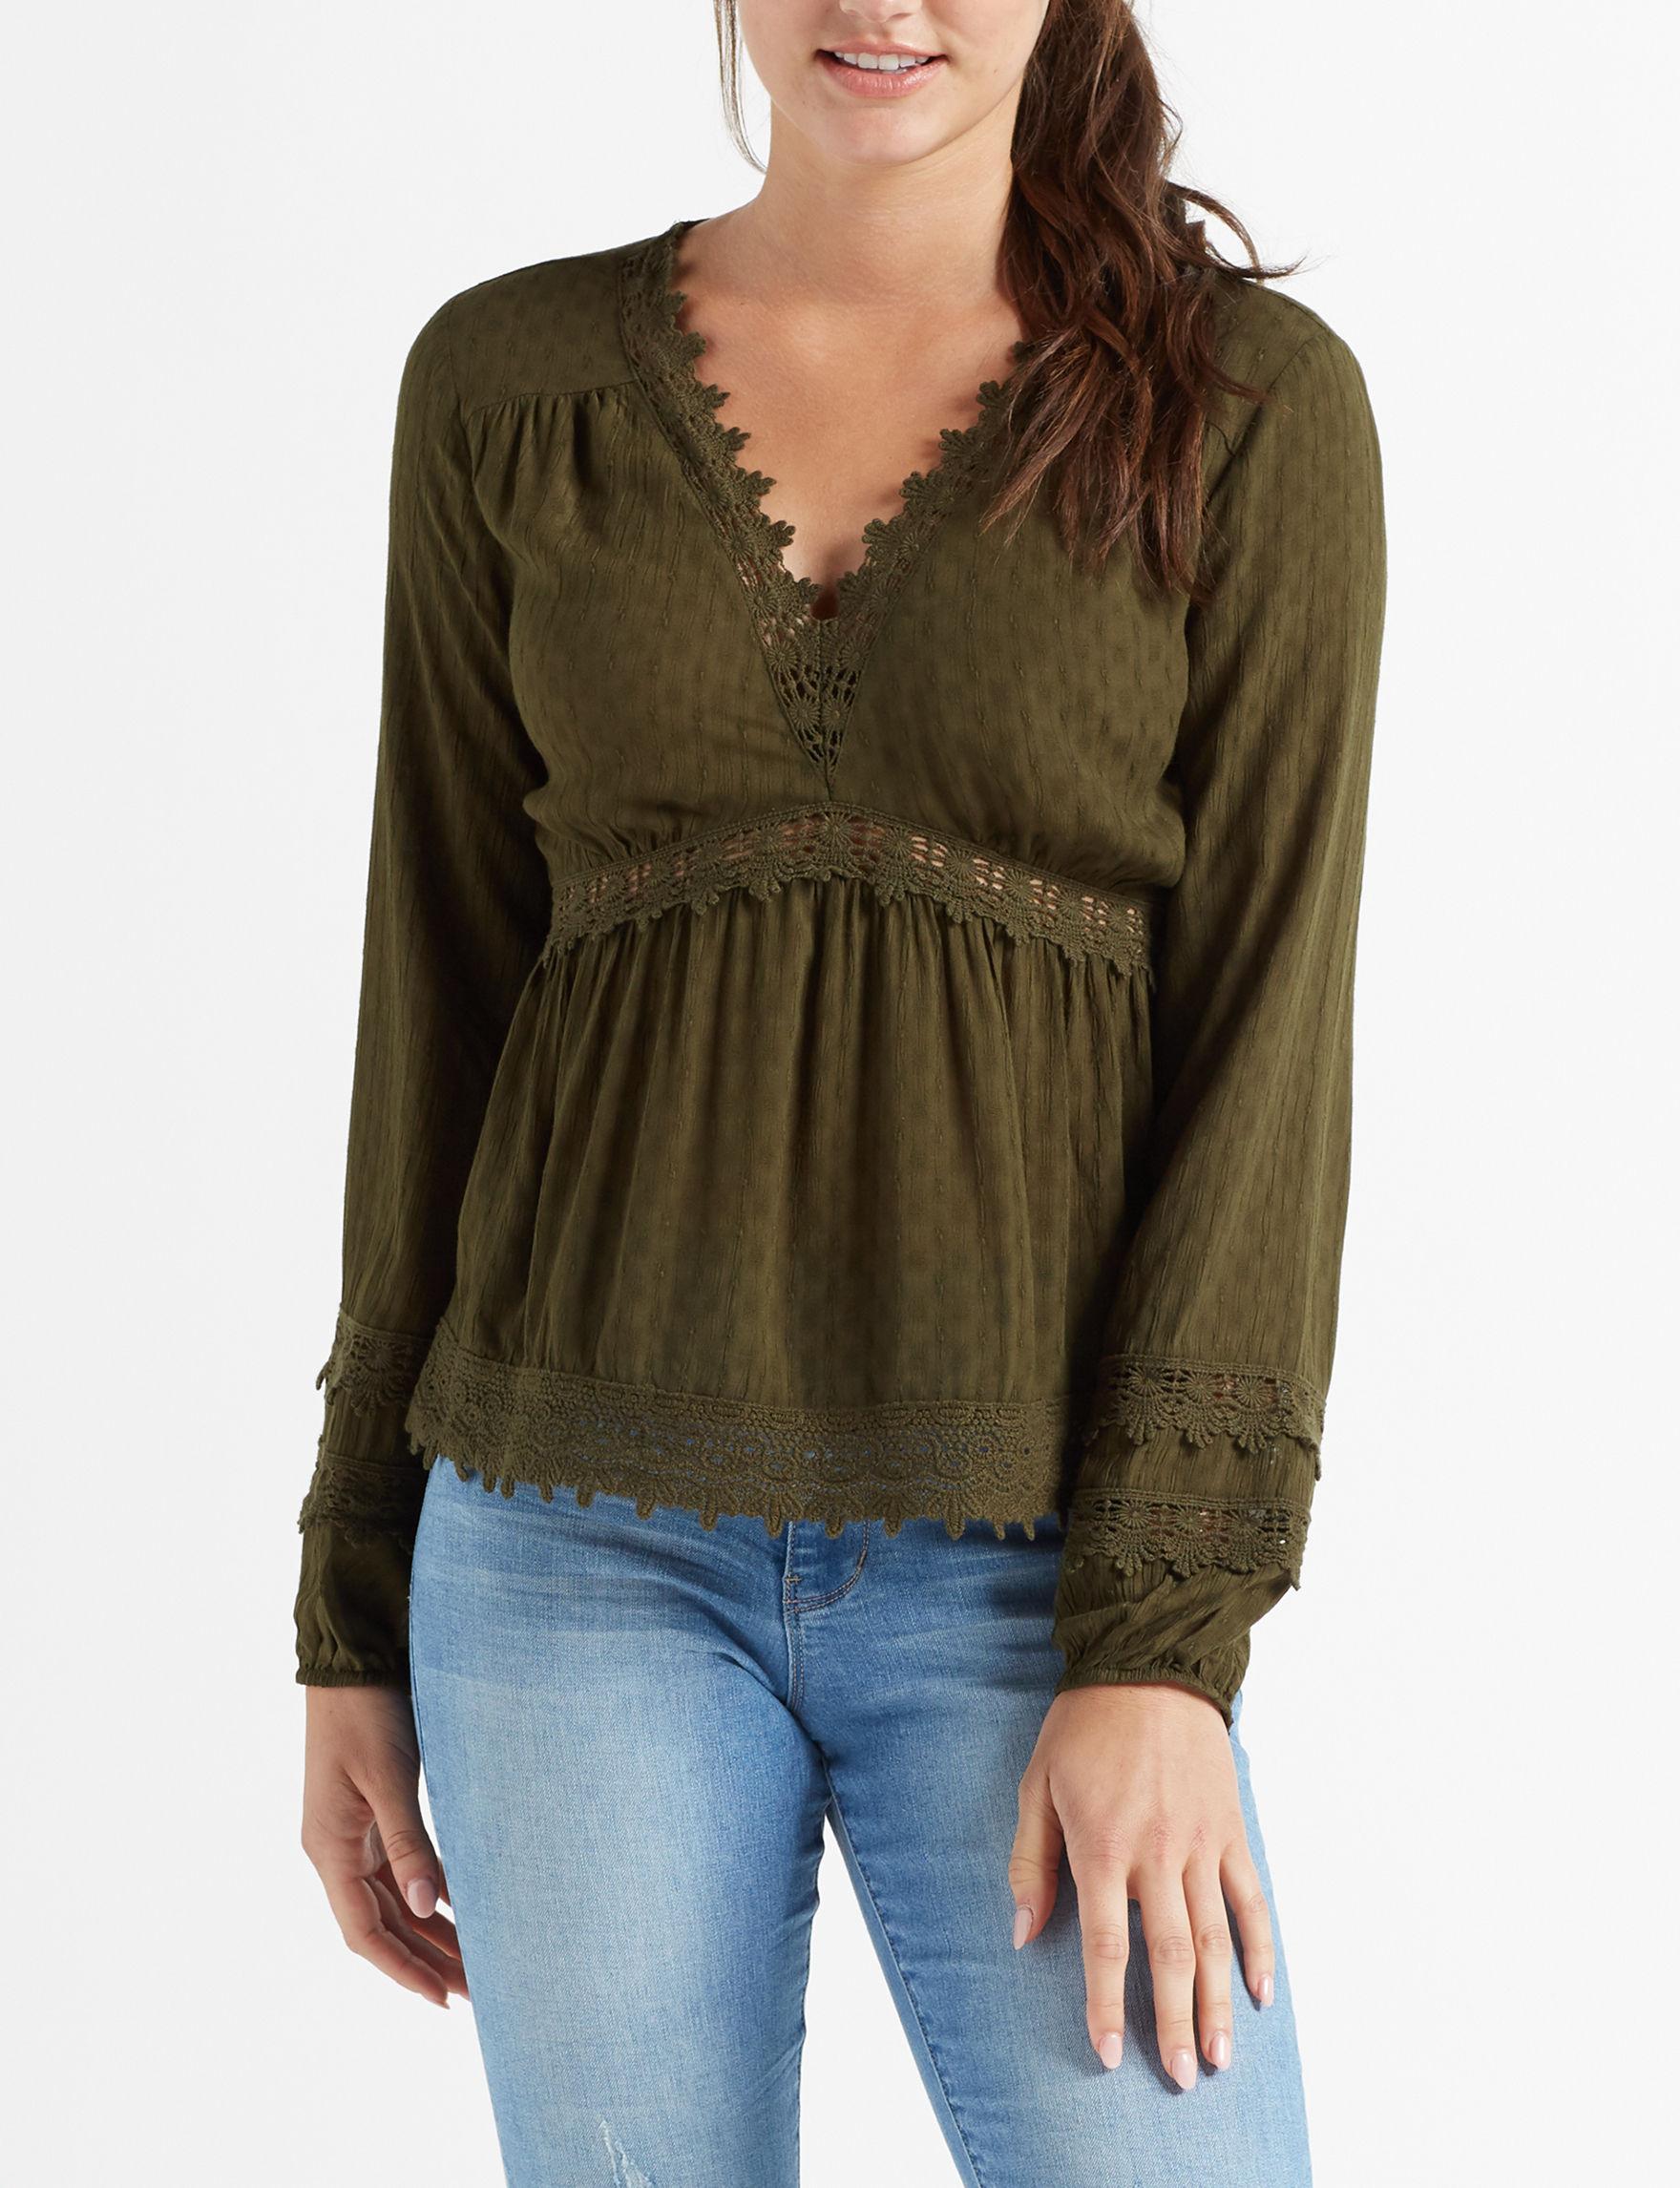 Leighton Green Shirts & Blouses